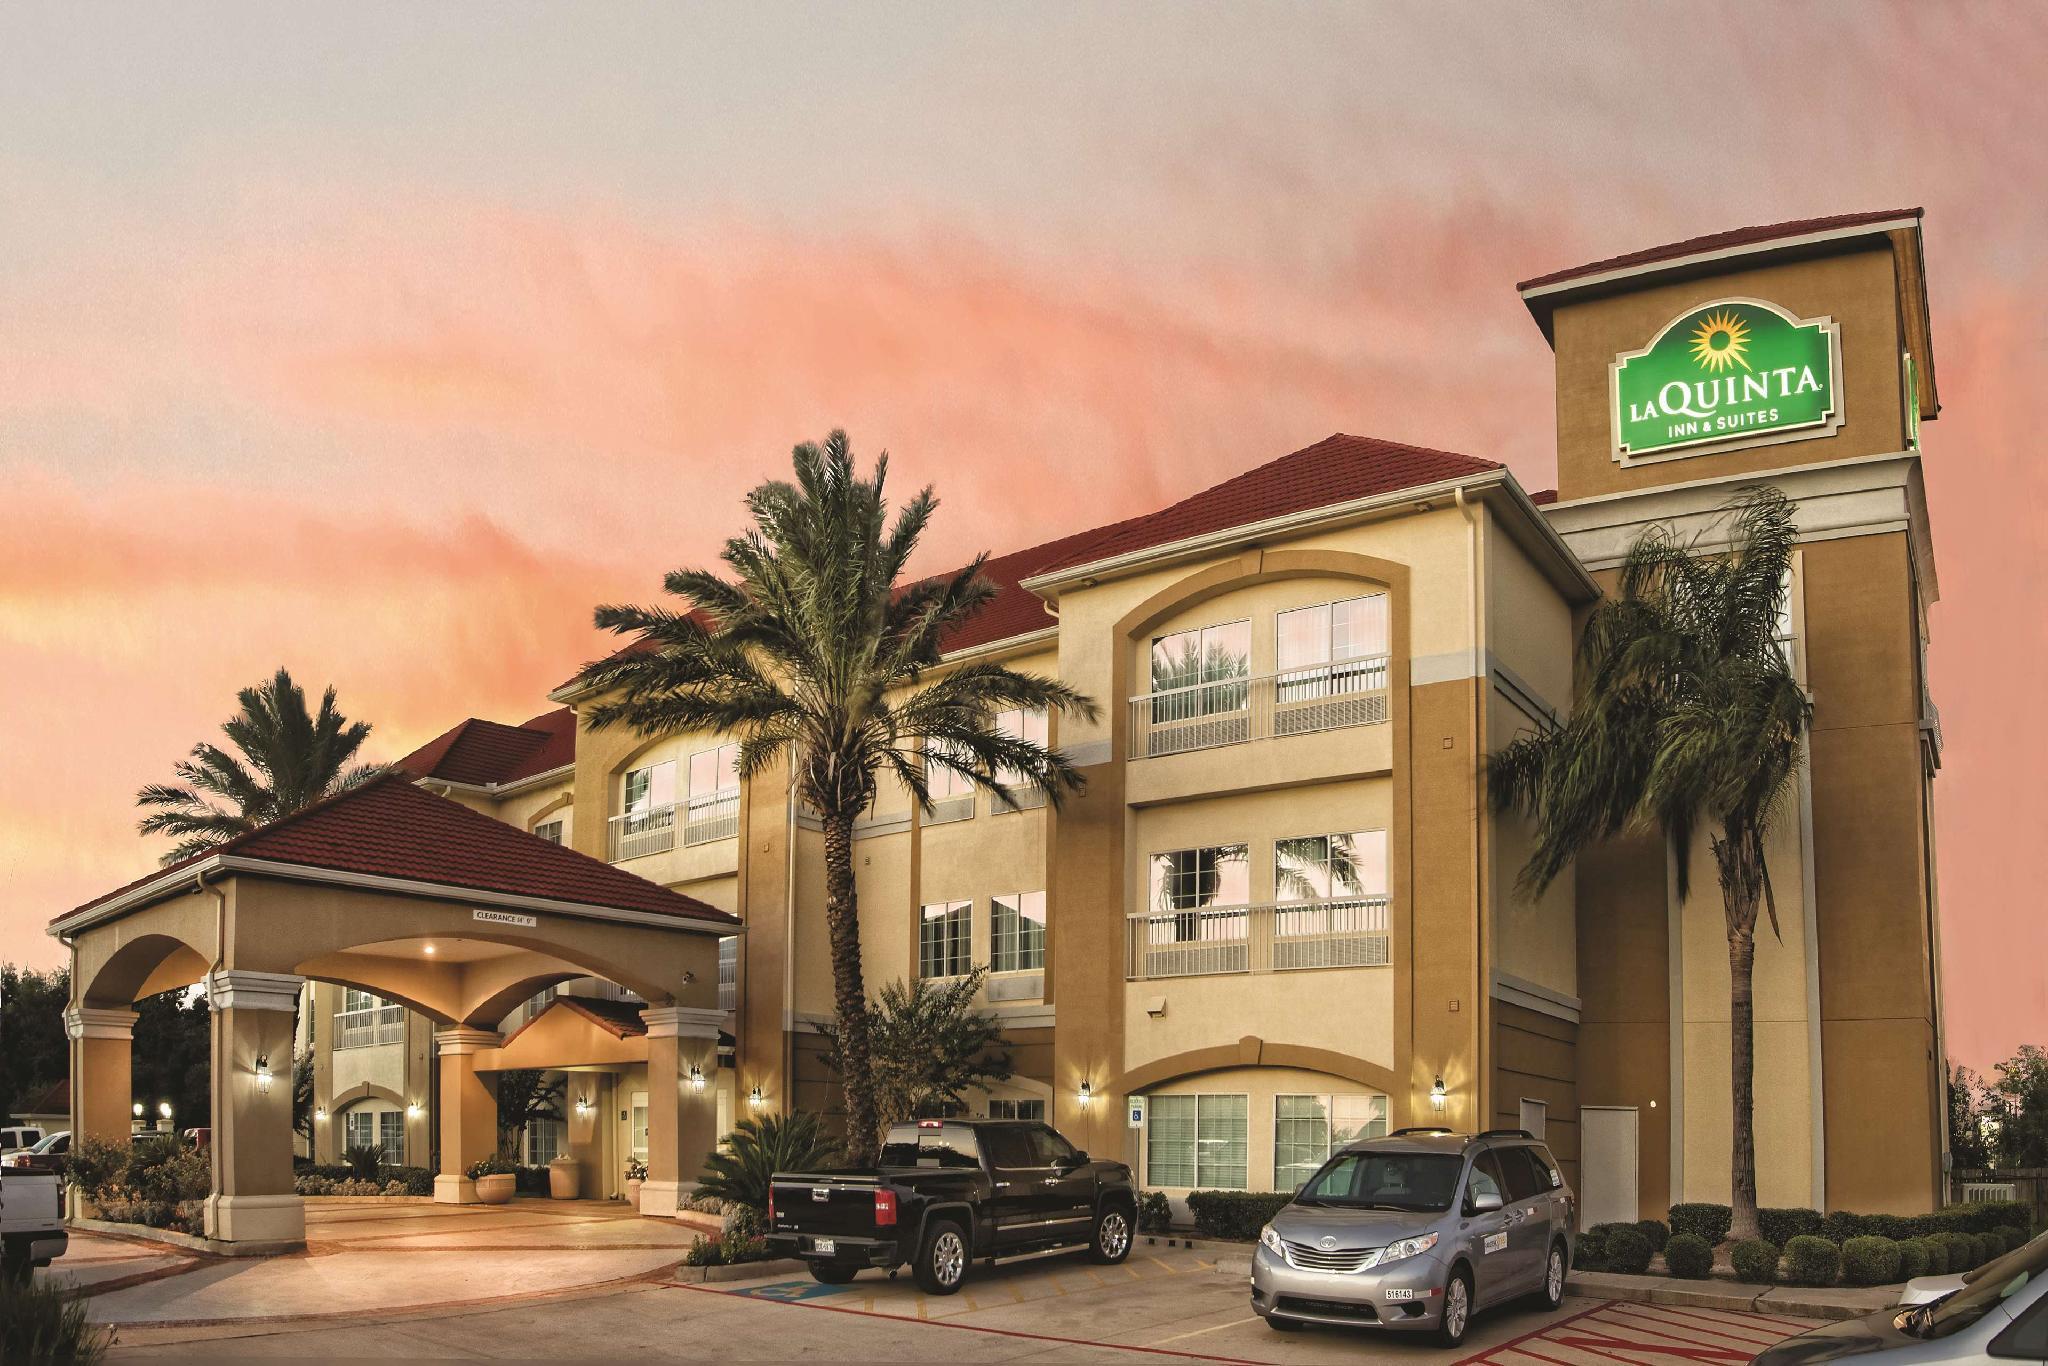 La Quinta Inn And Suites By Wyndham Houston Rosenberg